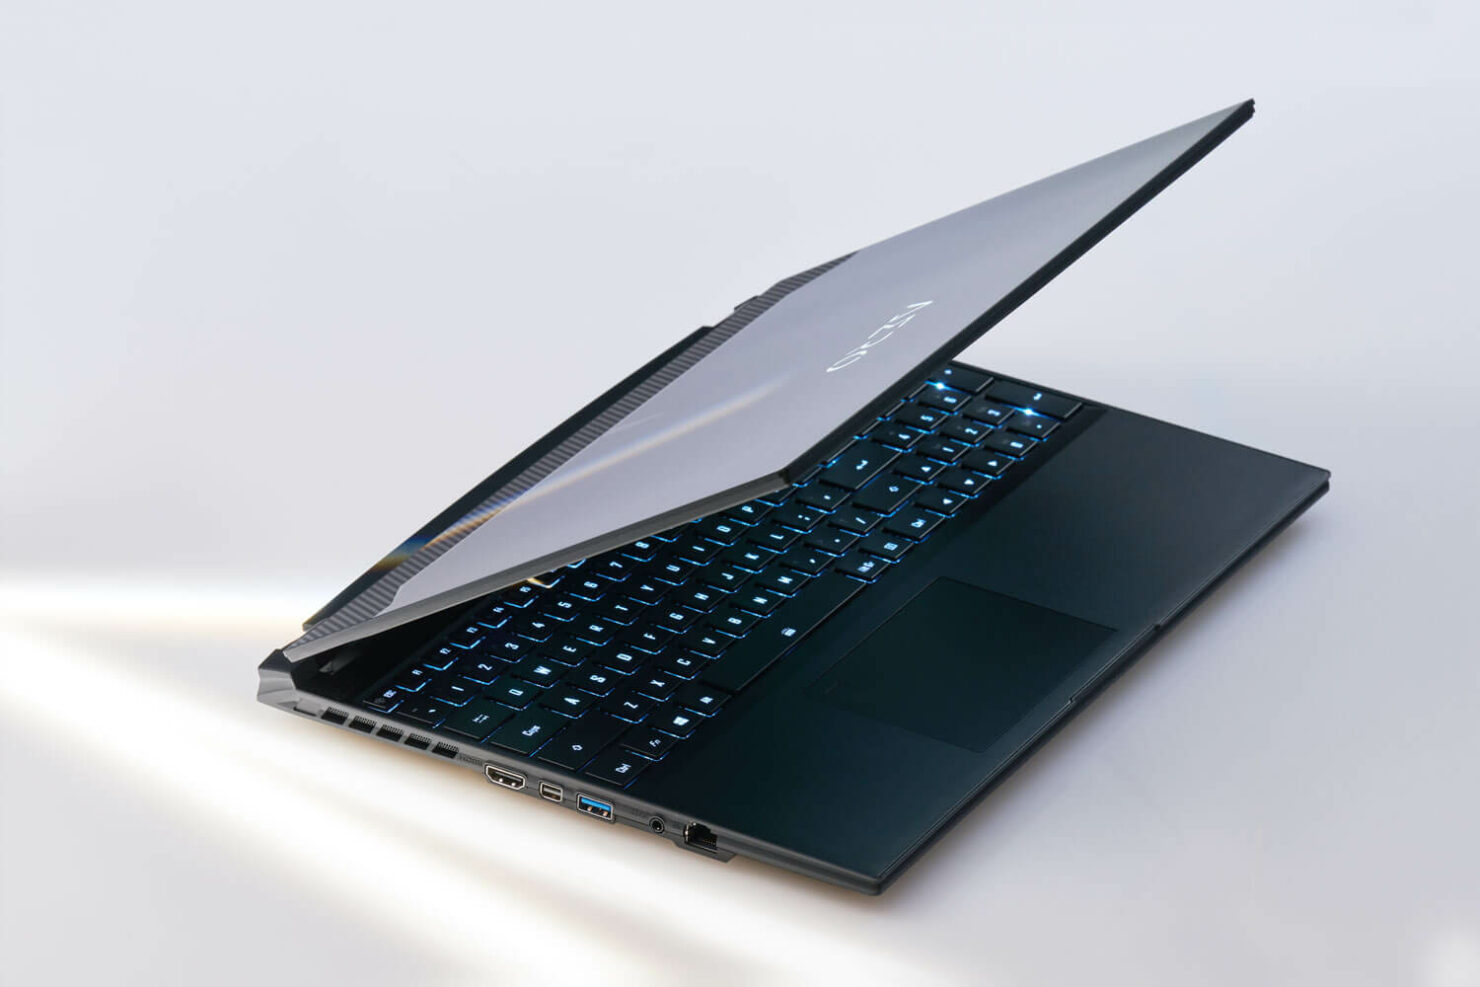 aero-intel-11th-gen-laptop-6